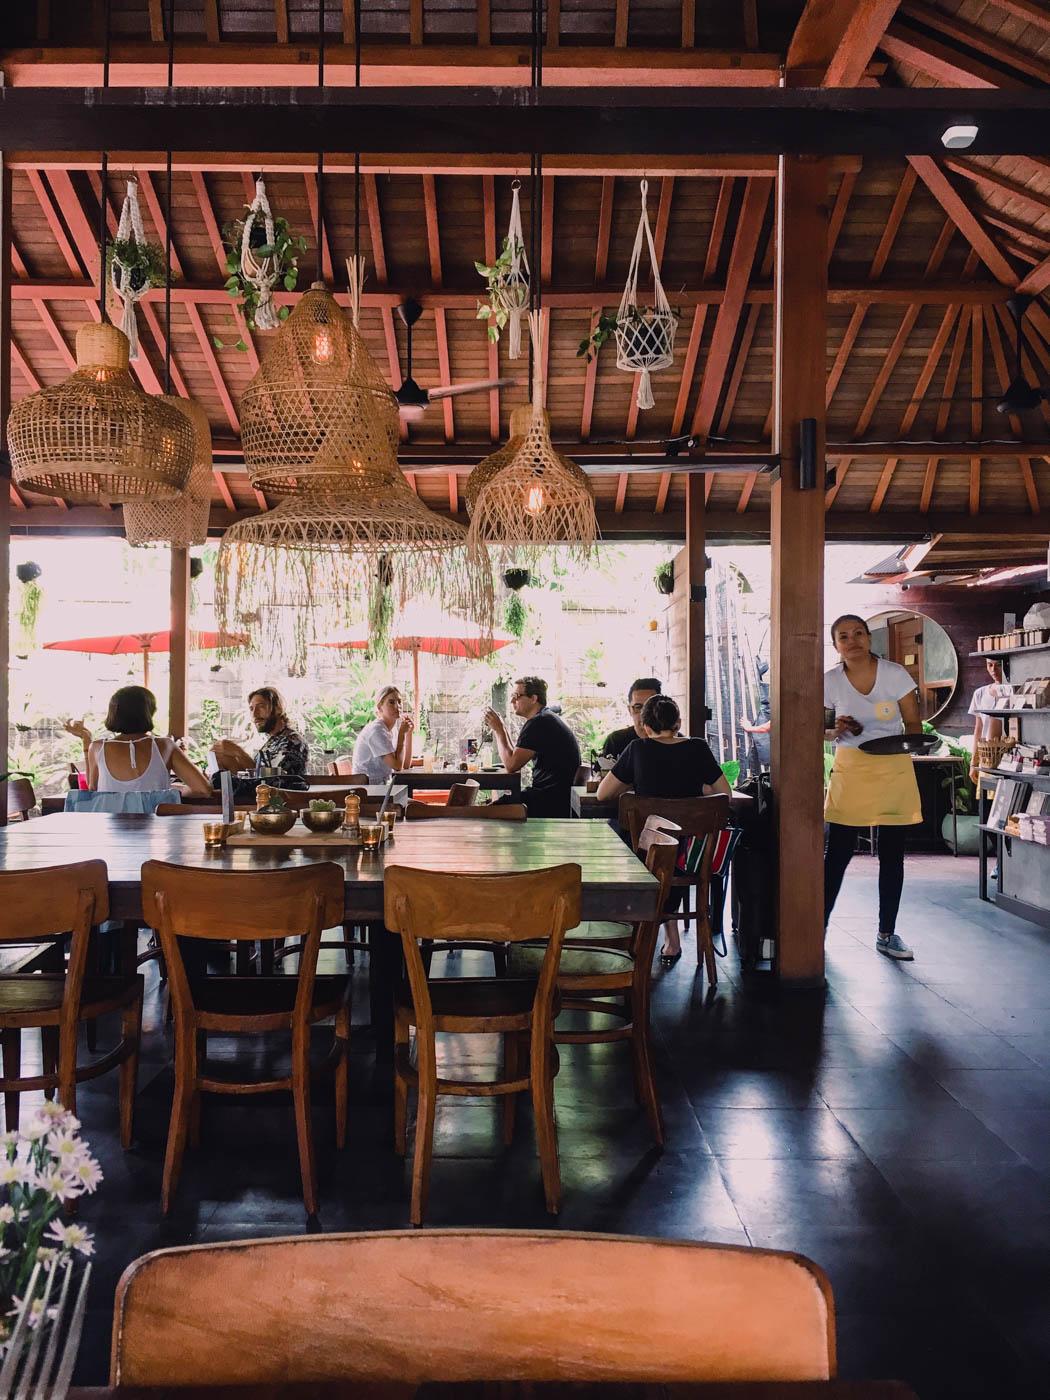 Milk & Madu, Canggu, Bali #traveldestinations #bali #beautifulplaces